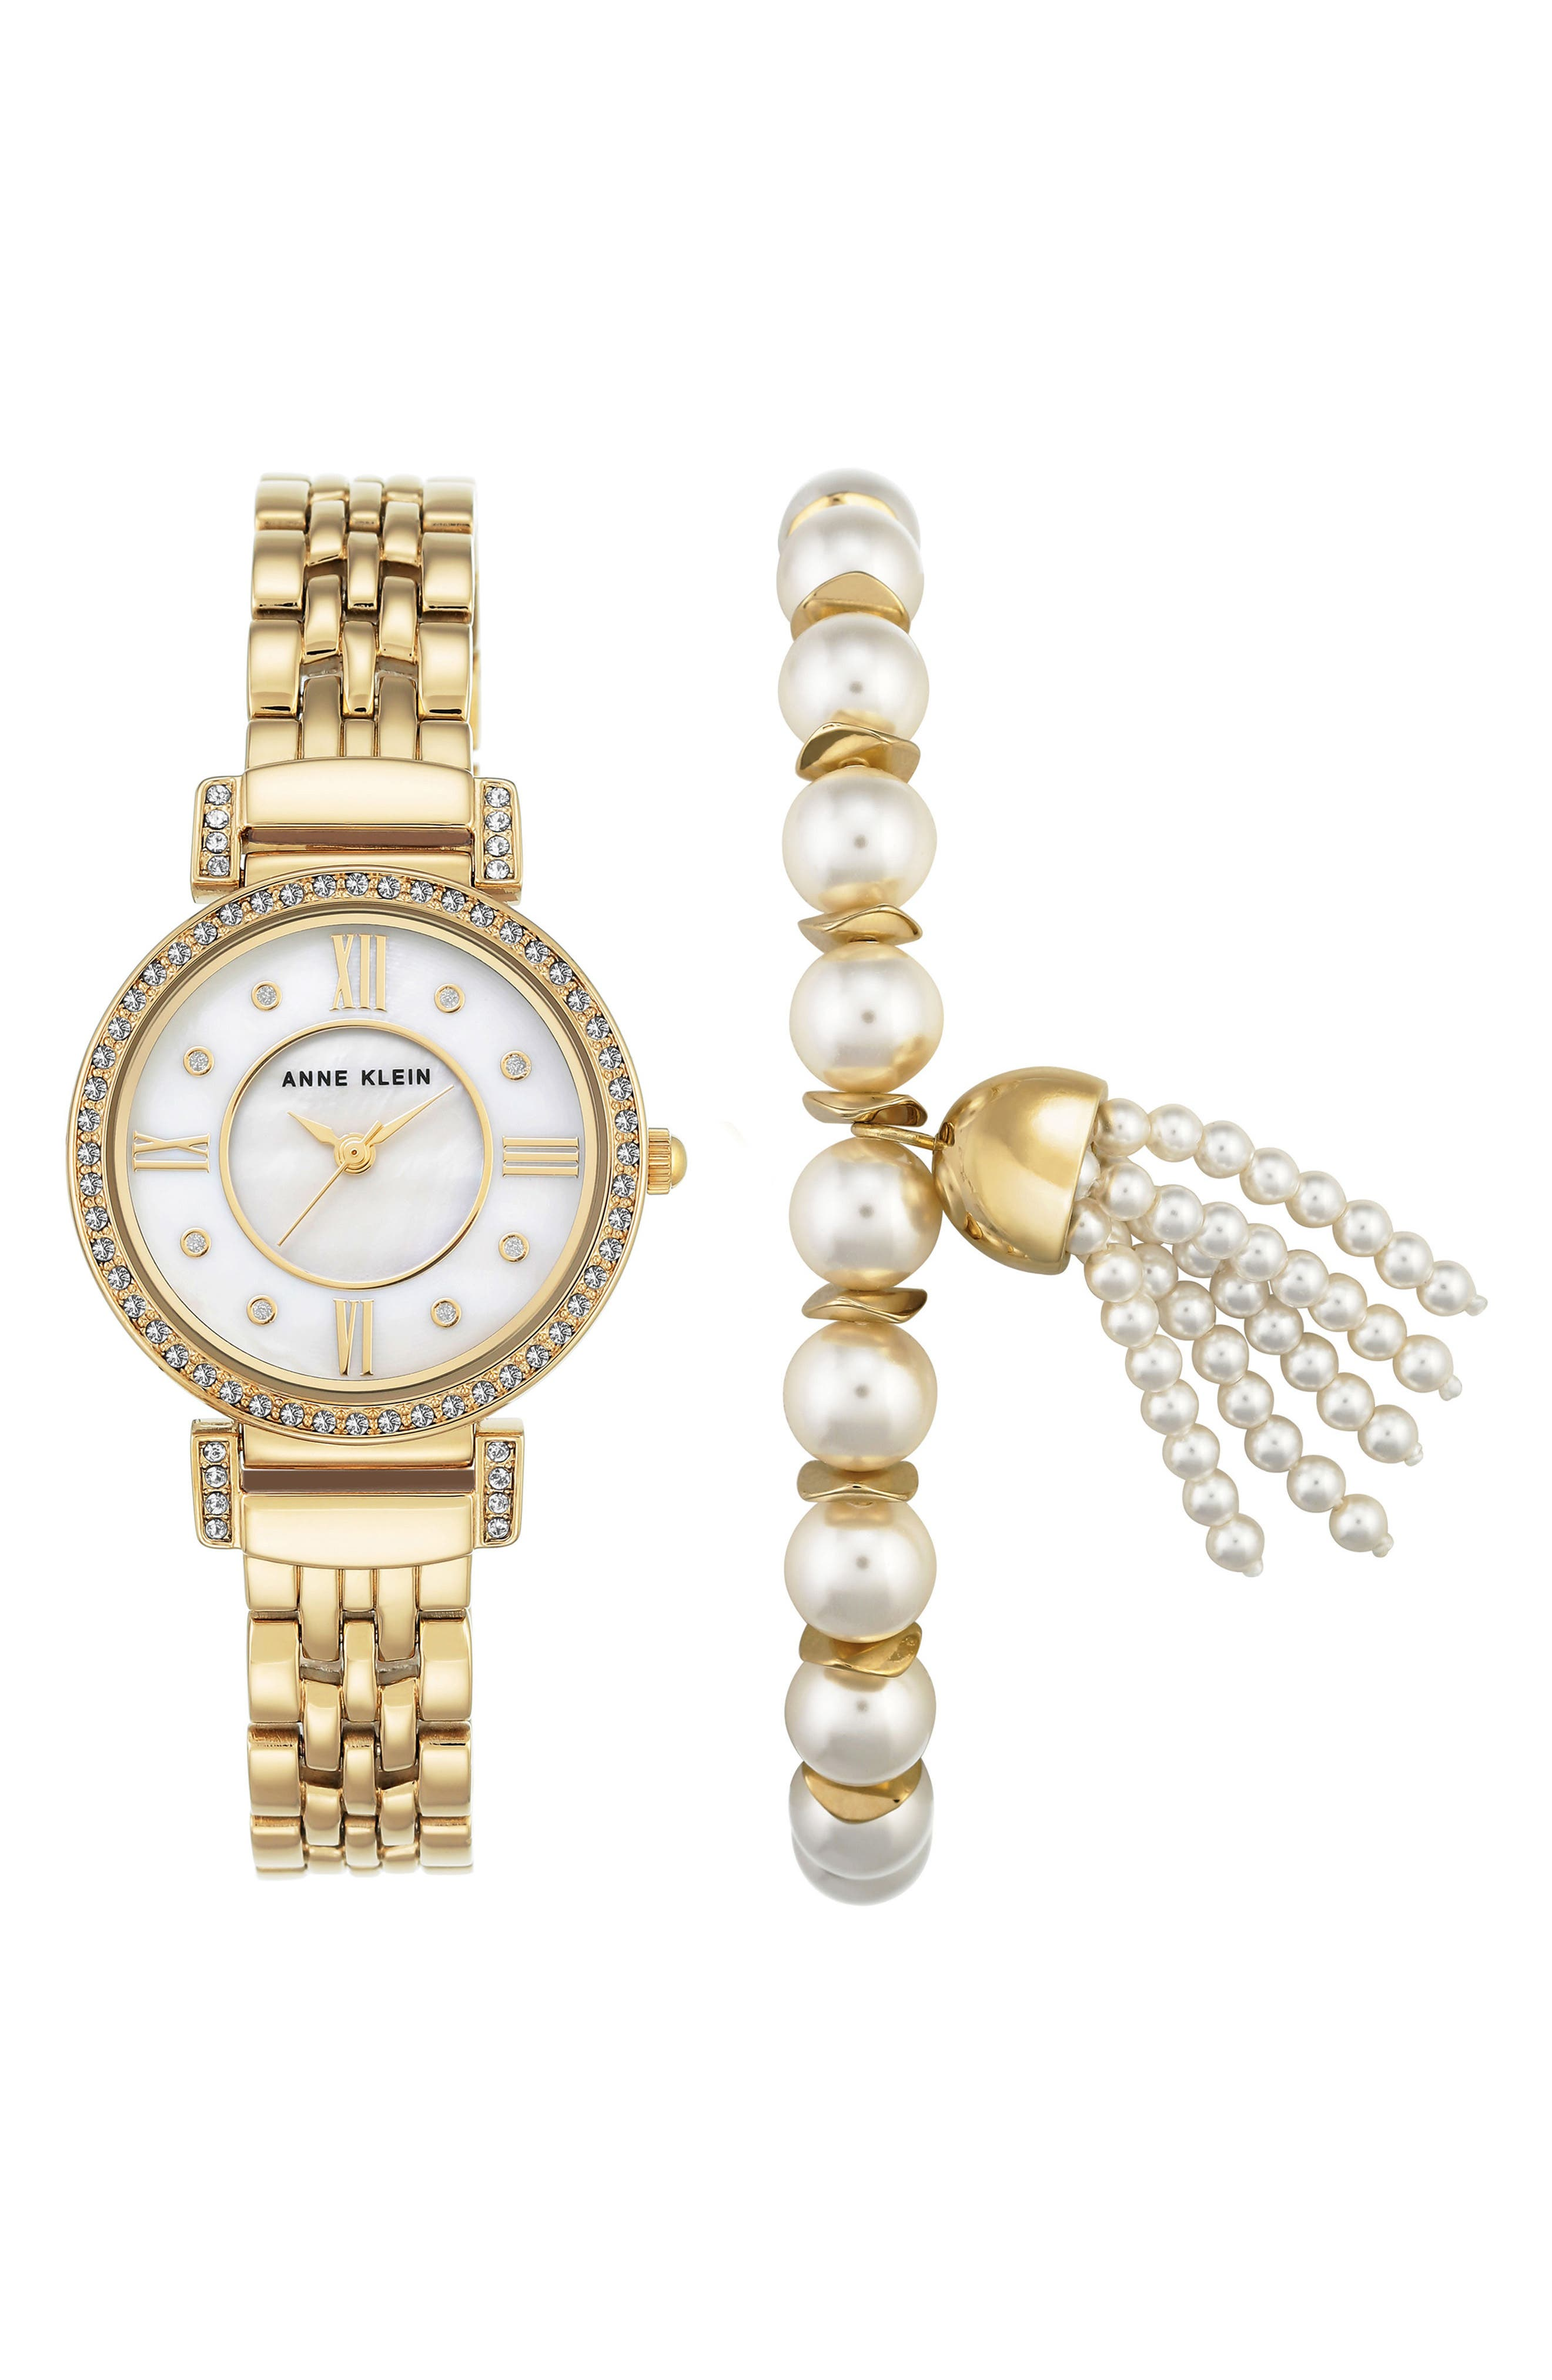 Anne Klein Crystal Watch & Tassel Bracelet Set